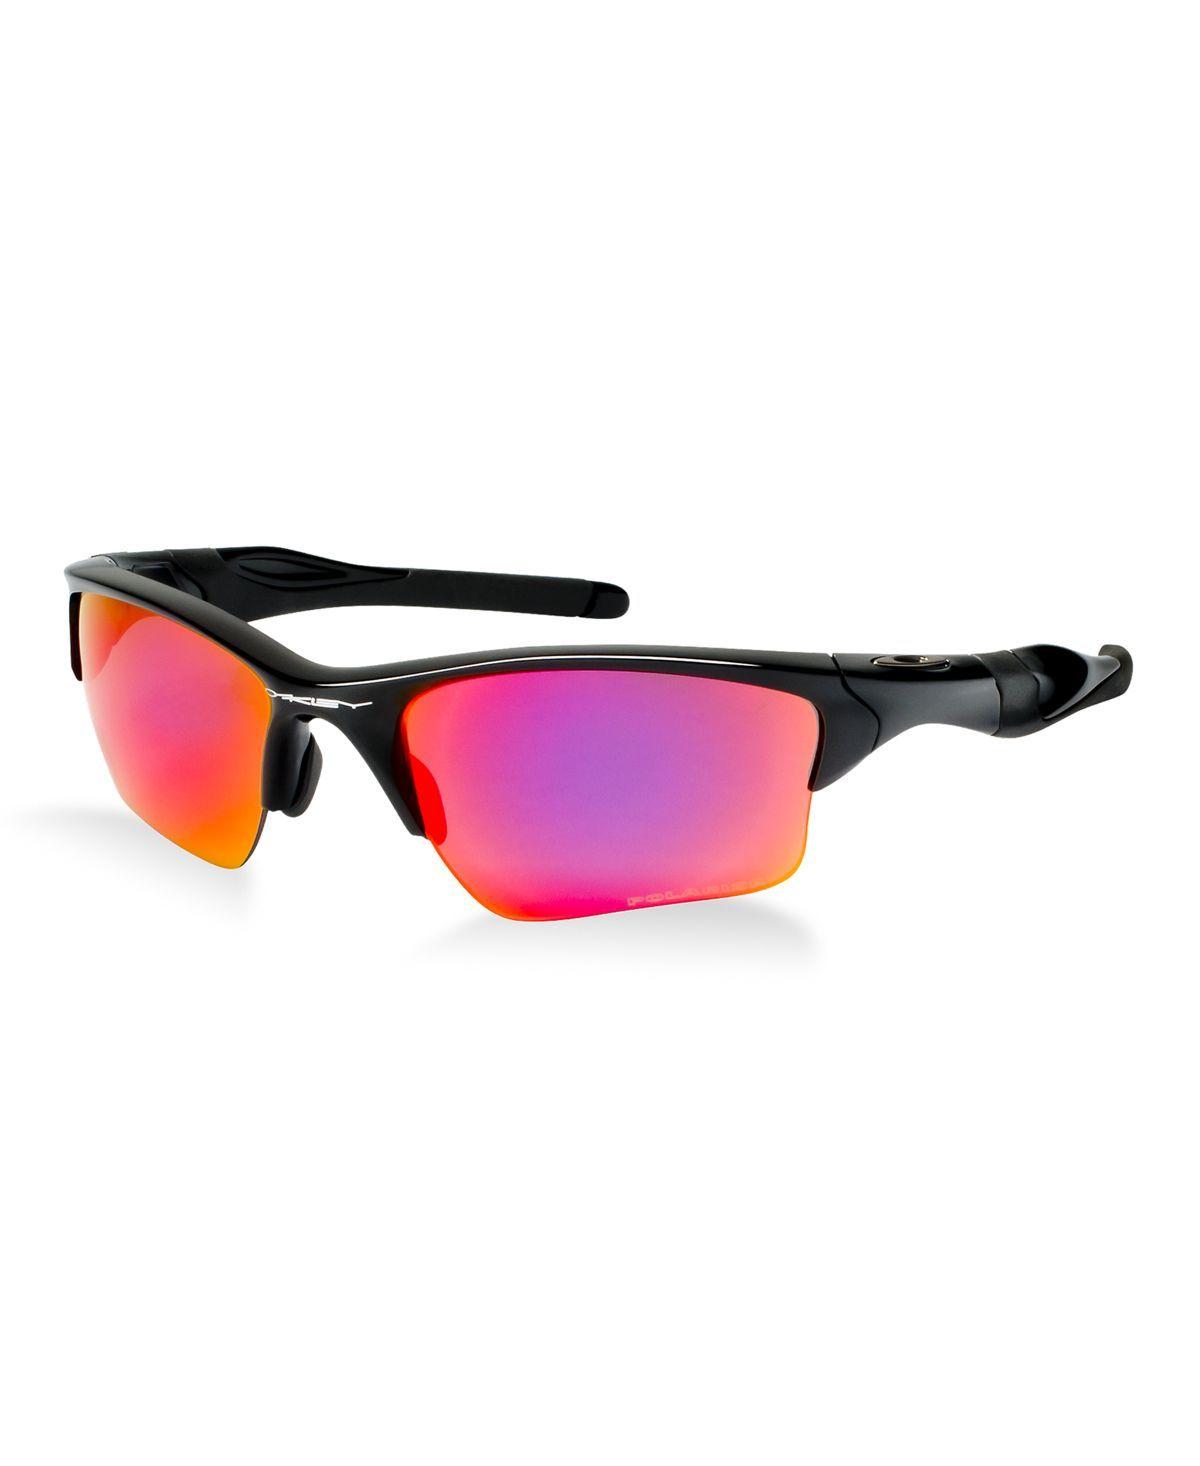 4616f07dd5 Oakley Sunglasses, OO9154 Half Jacket 2.0 Xl | Products | Sunglasses ...